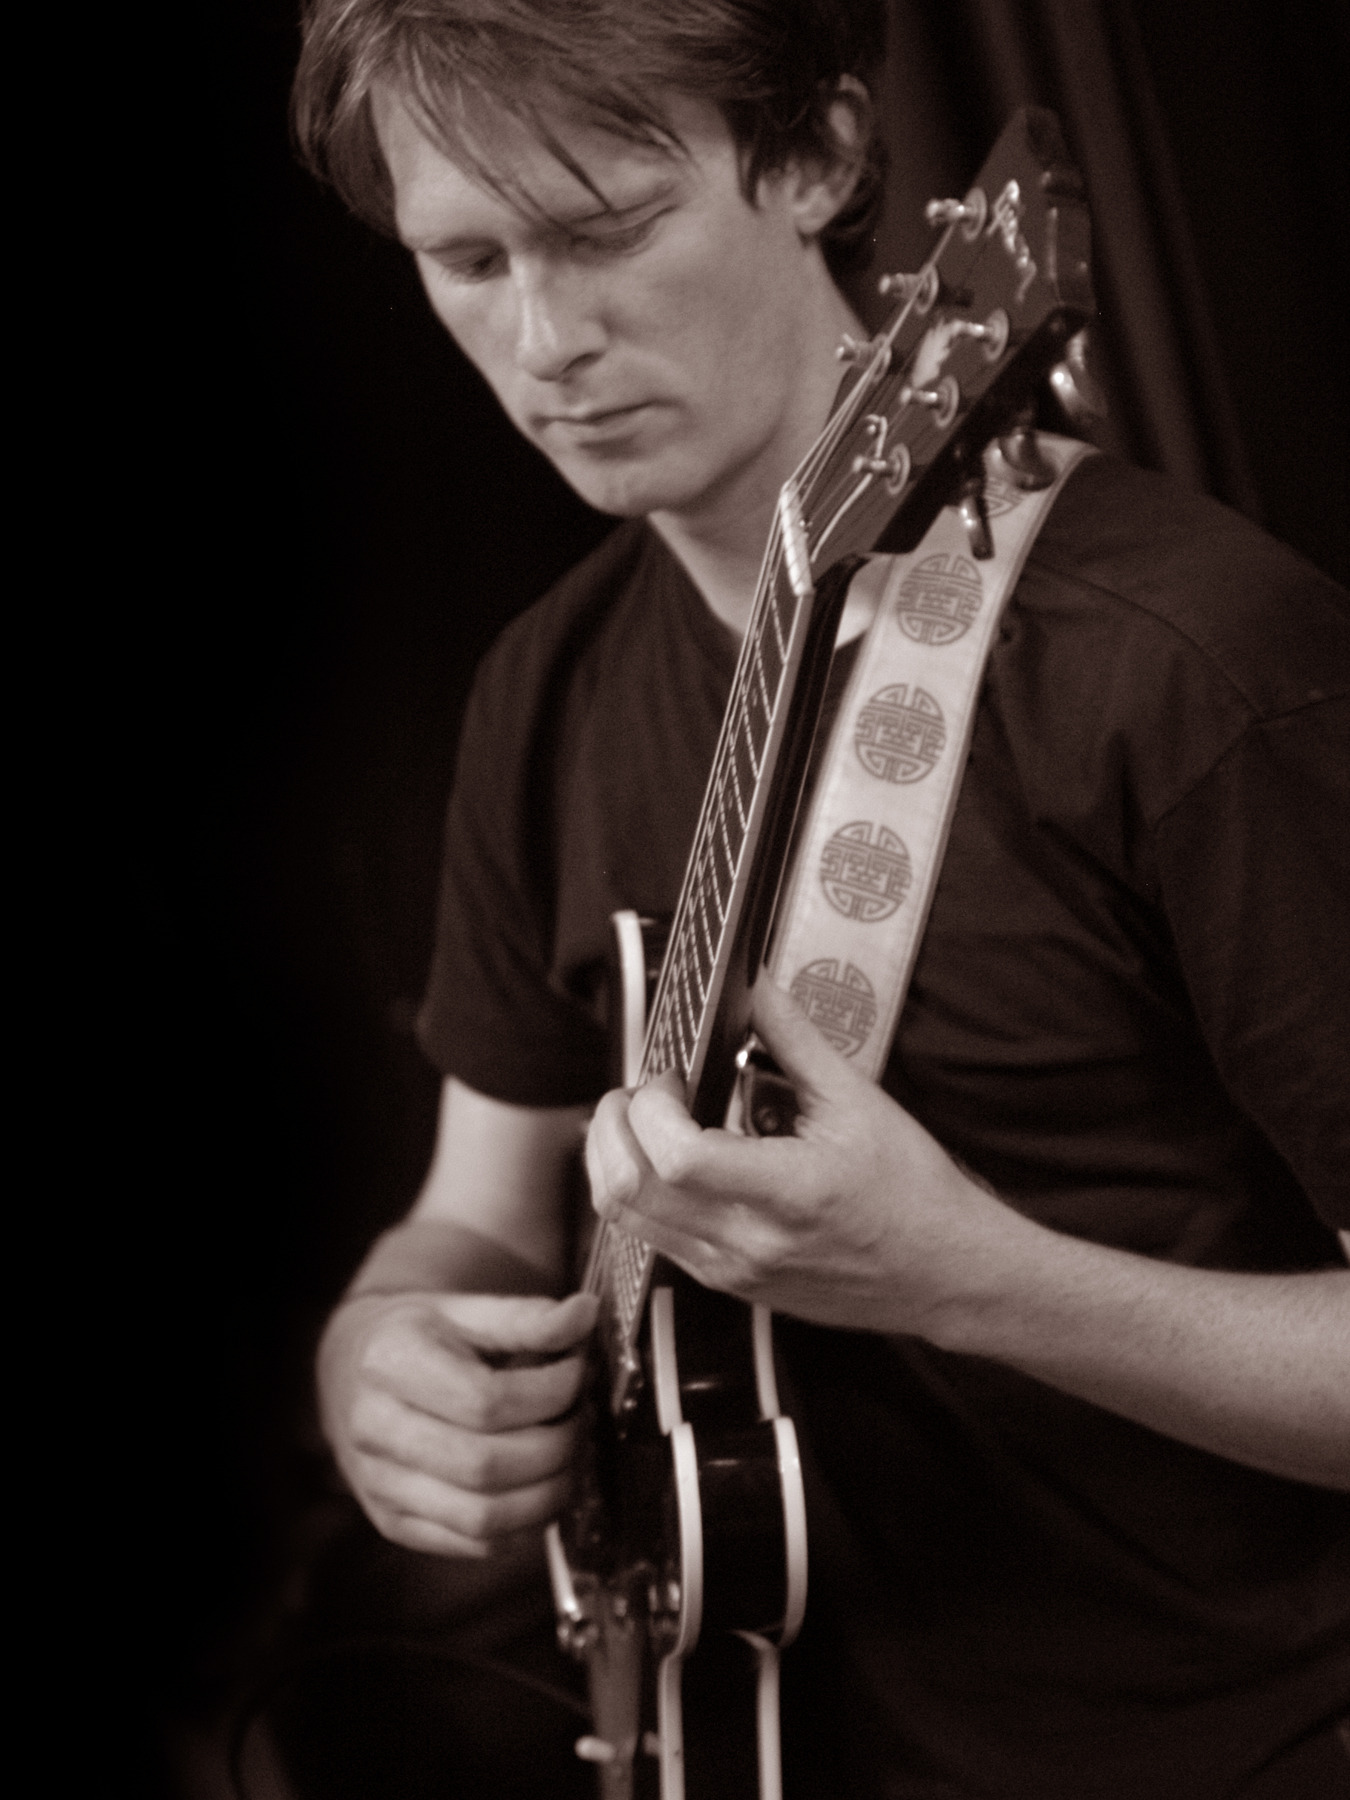 hugh-guitar-ss04.JPG